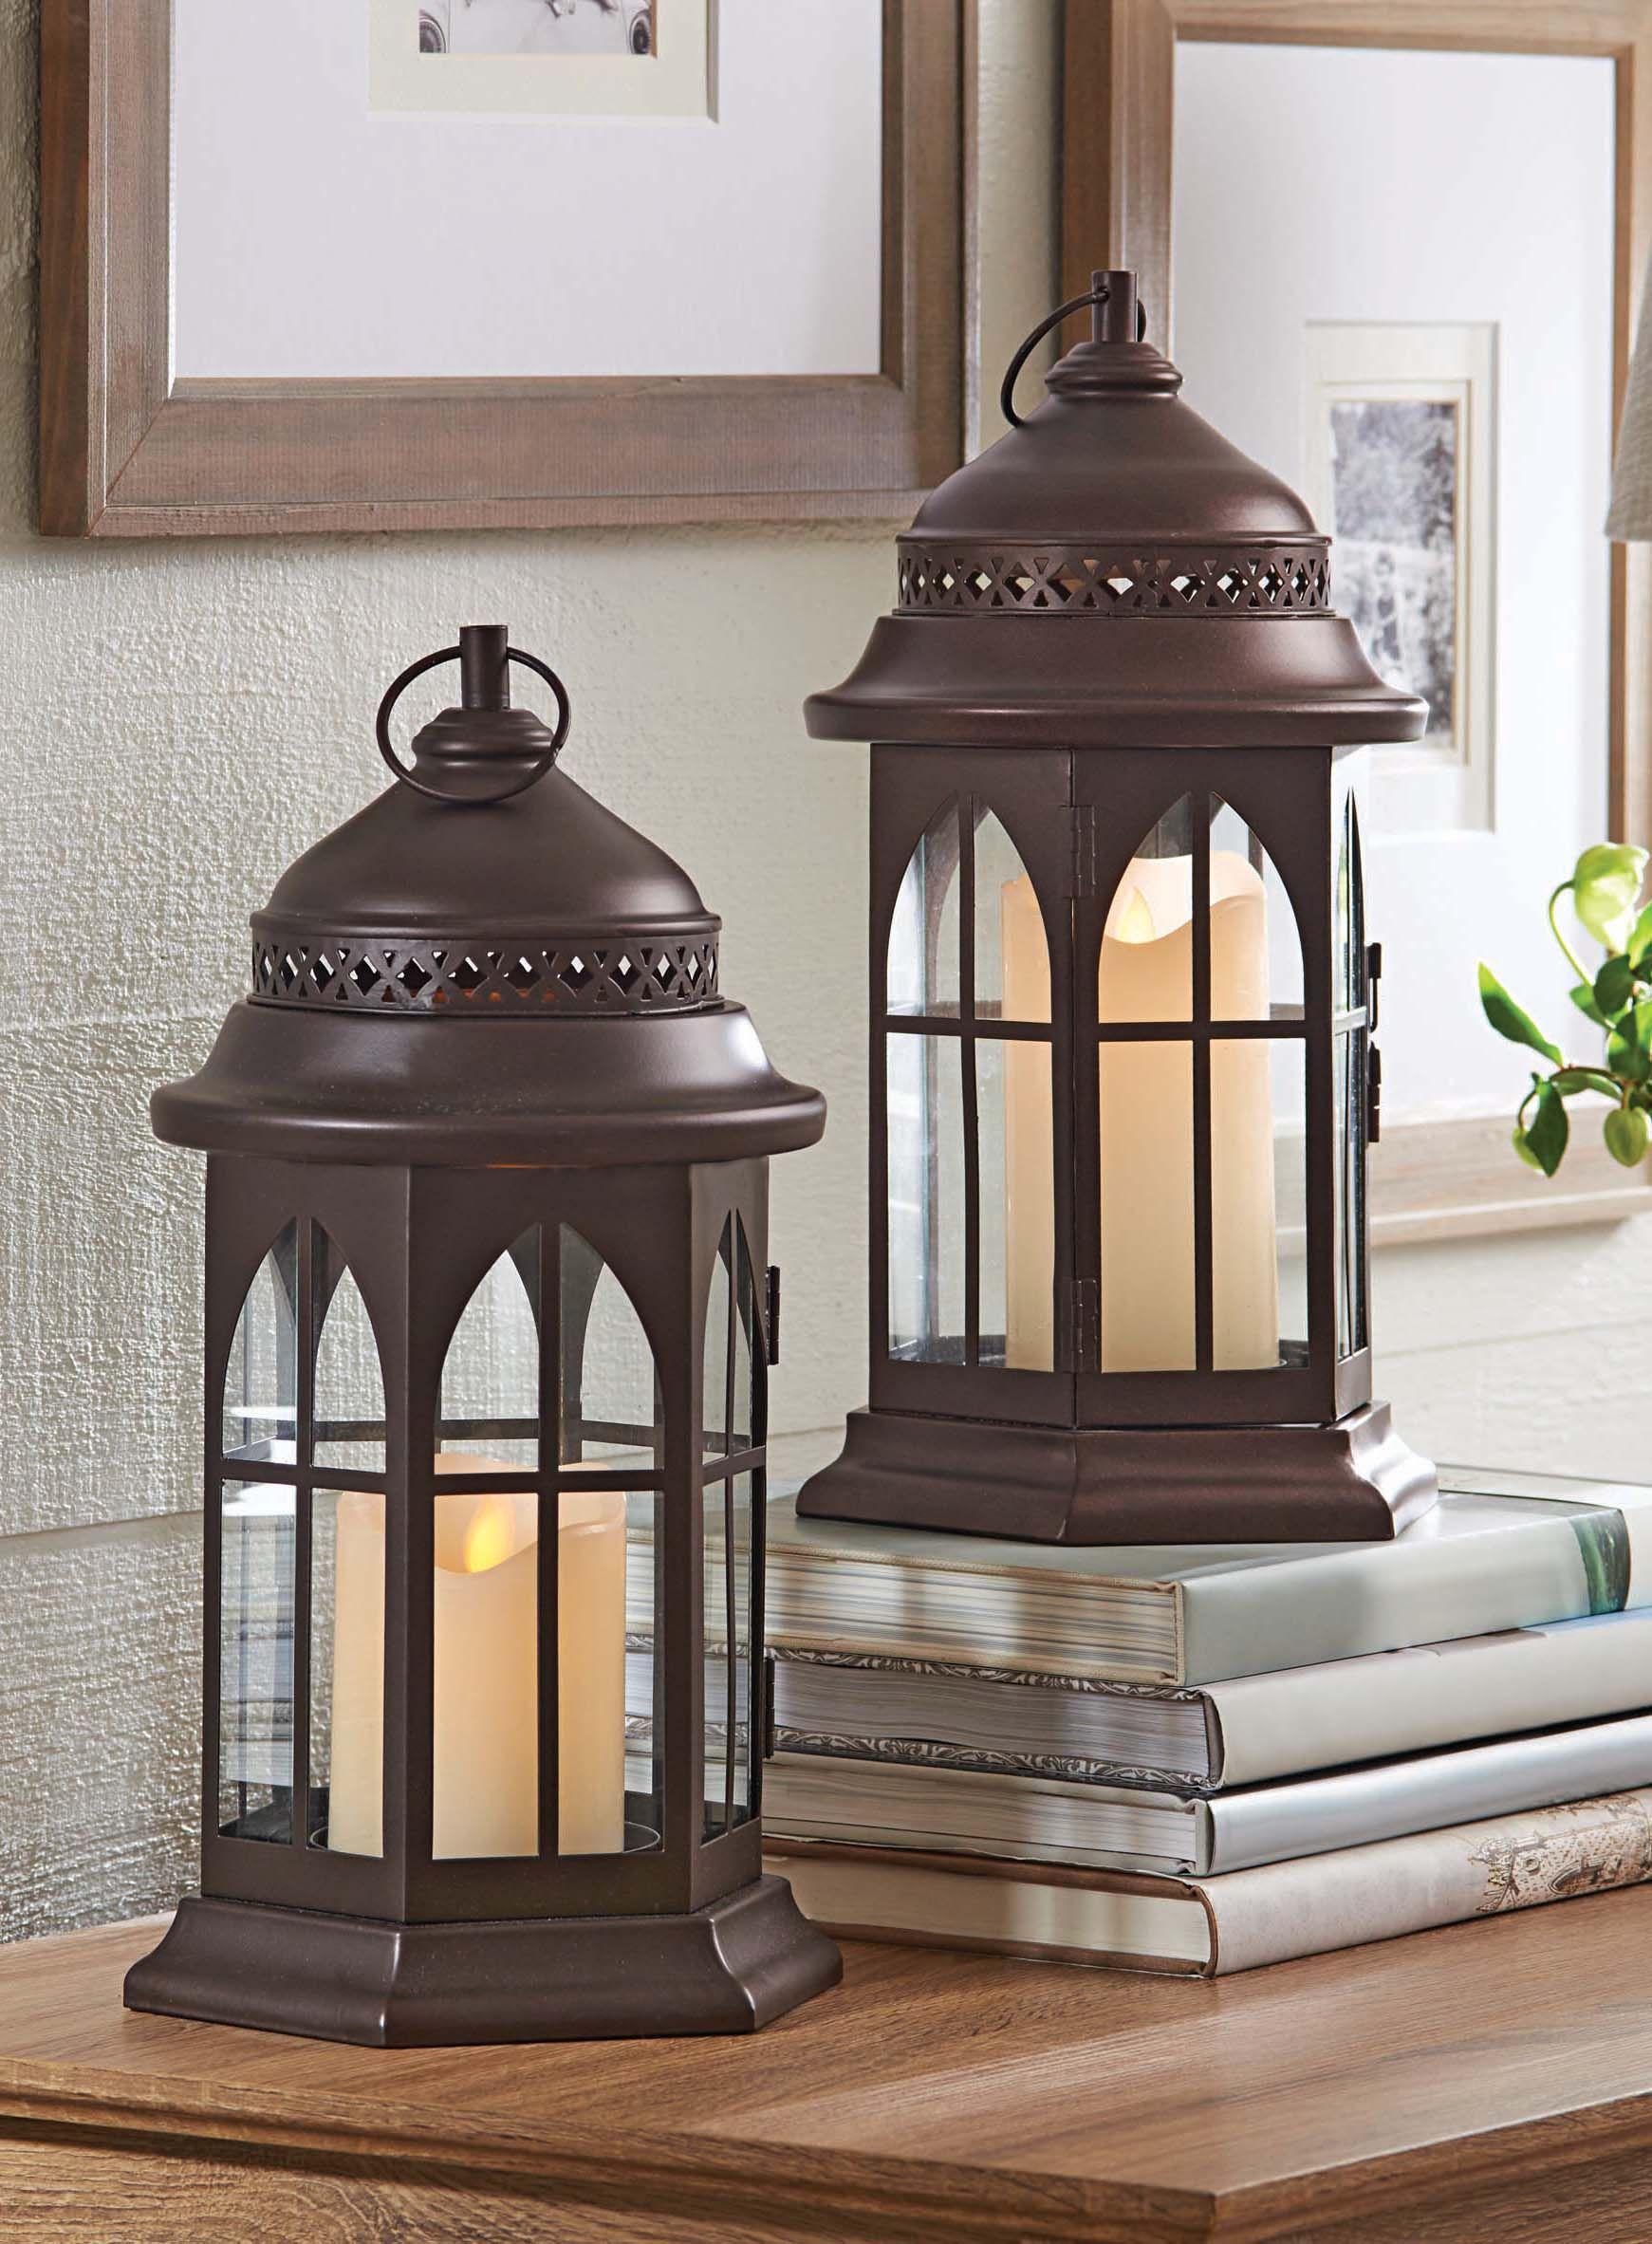 99d3a6d18cad0f5c0478da0be878fc2b - Better Homes And Gardens Farmhouse Large Lantern Rustic Finish